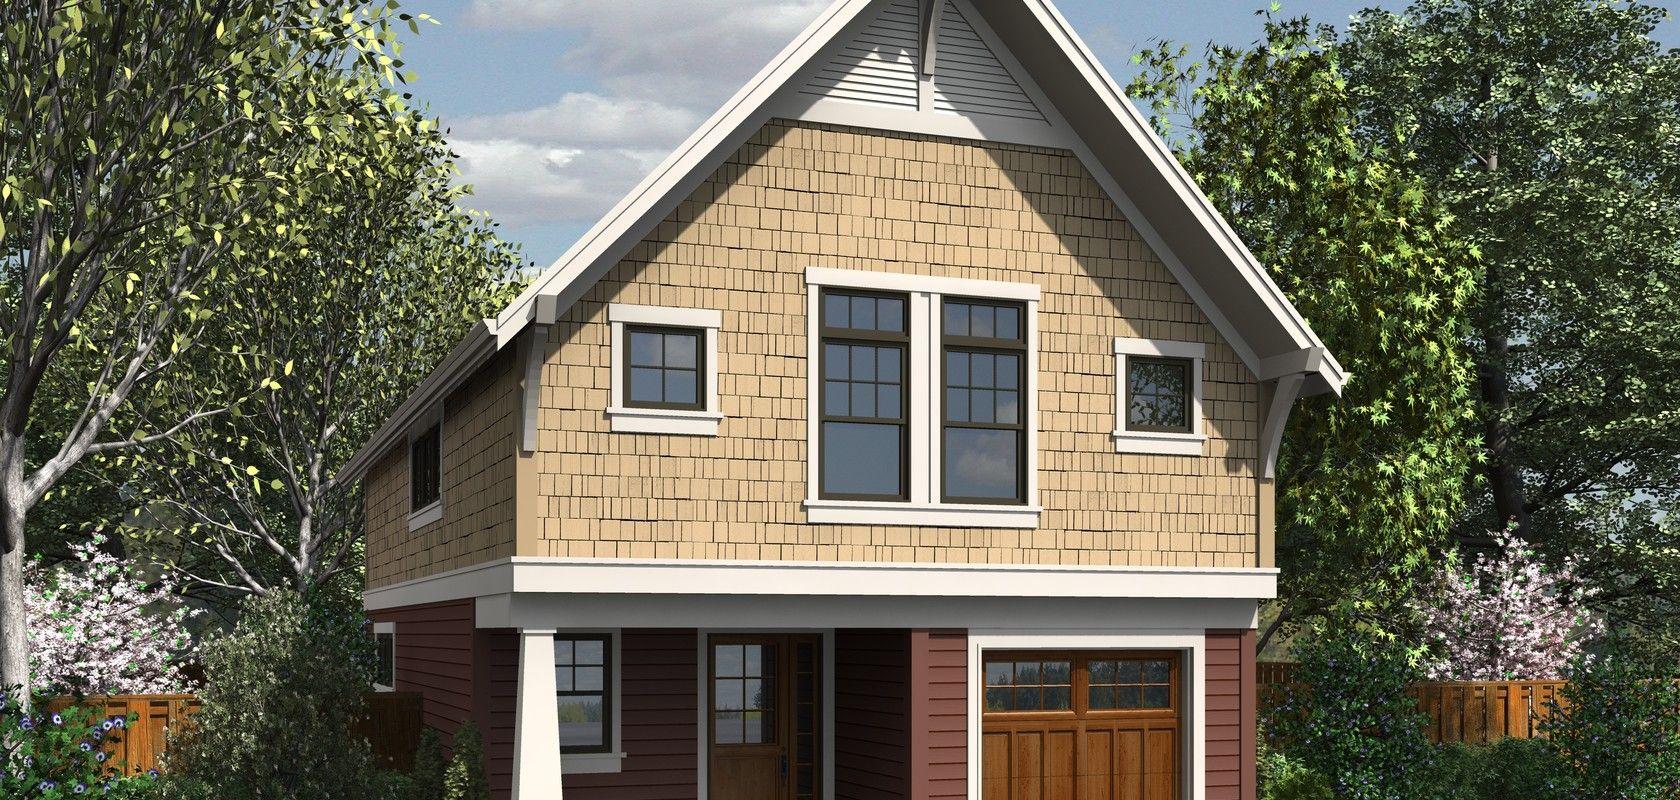 House Plans Half Baths Garage Bays Mascord